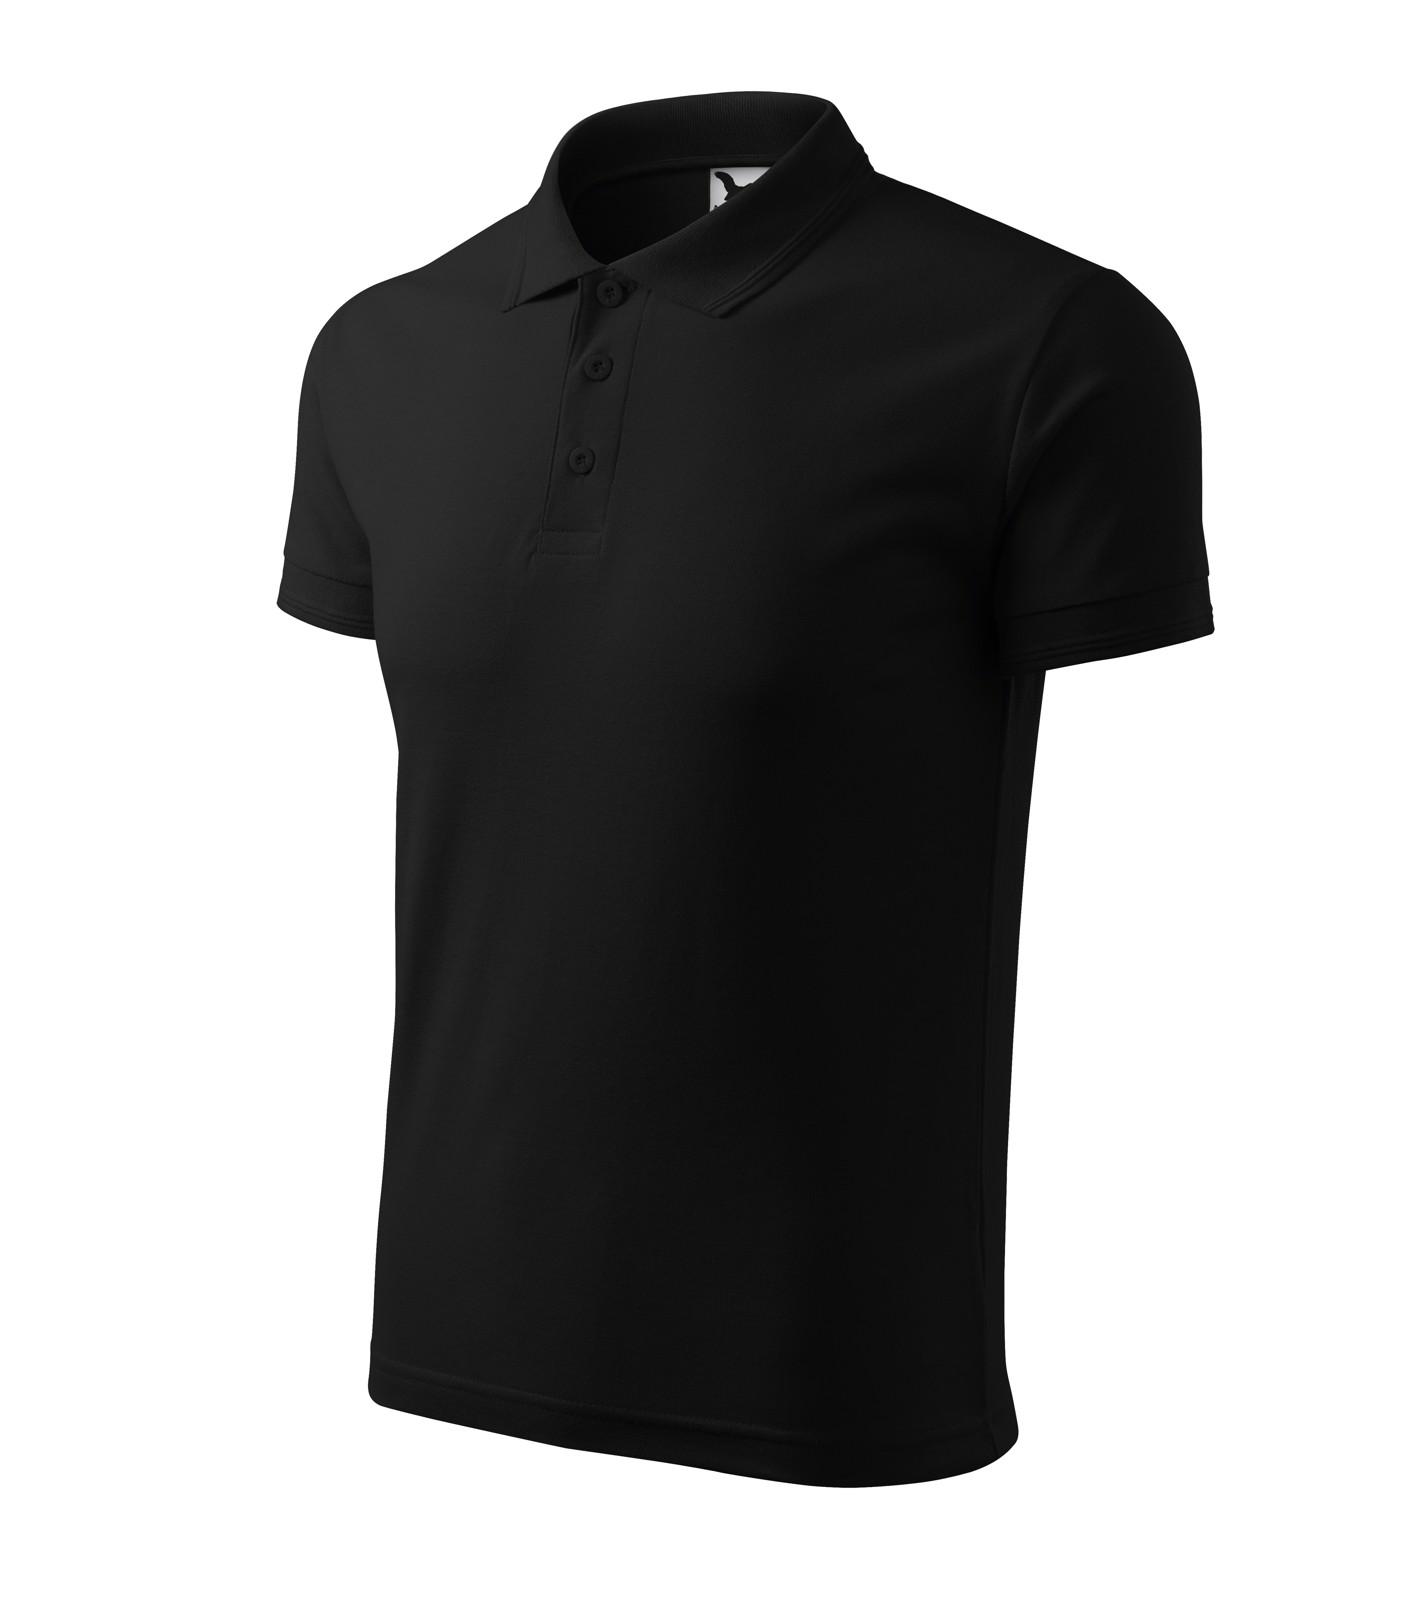 Polo Shirt men's Malfini Pique Polo - Black / L